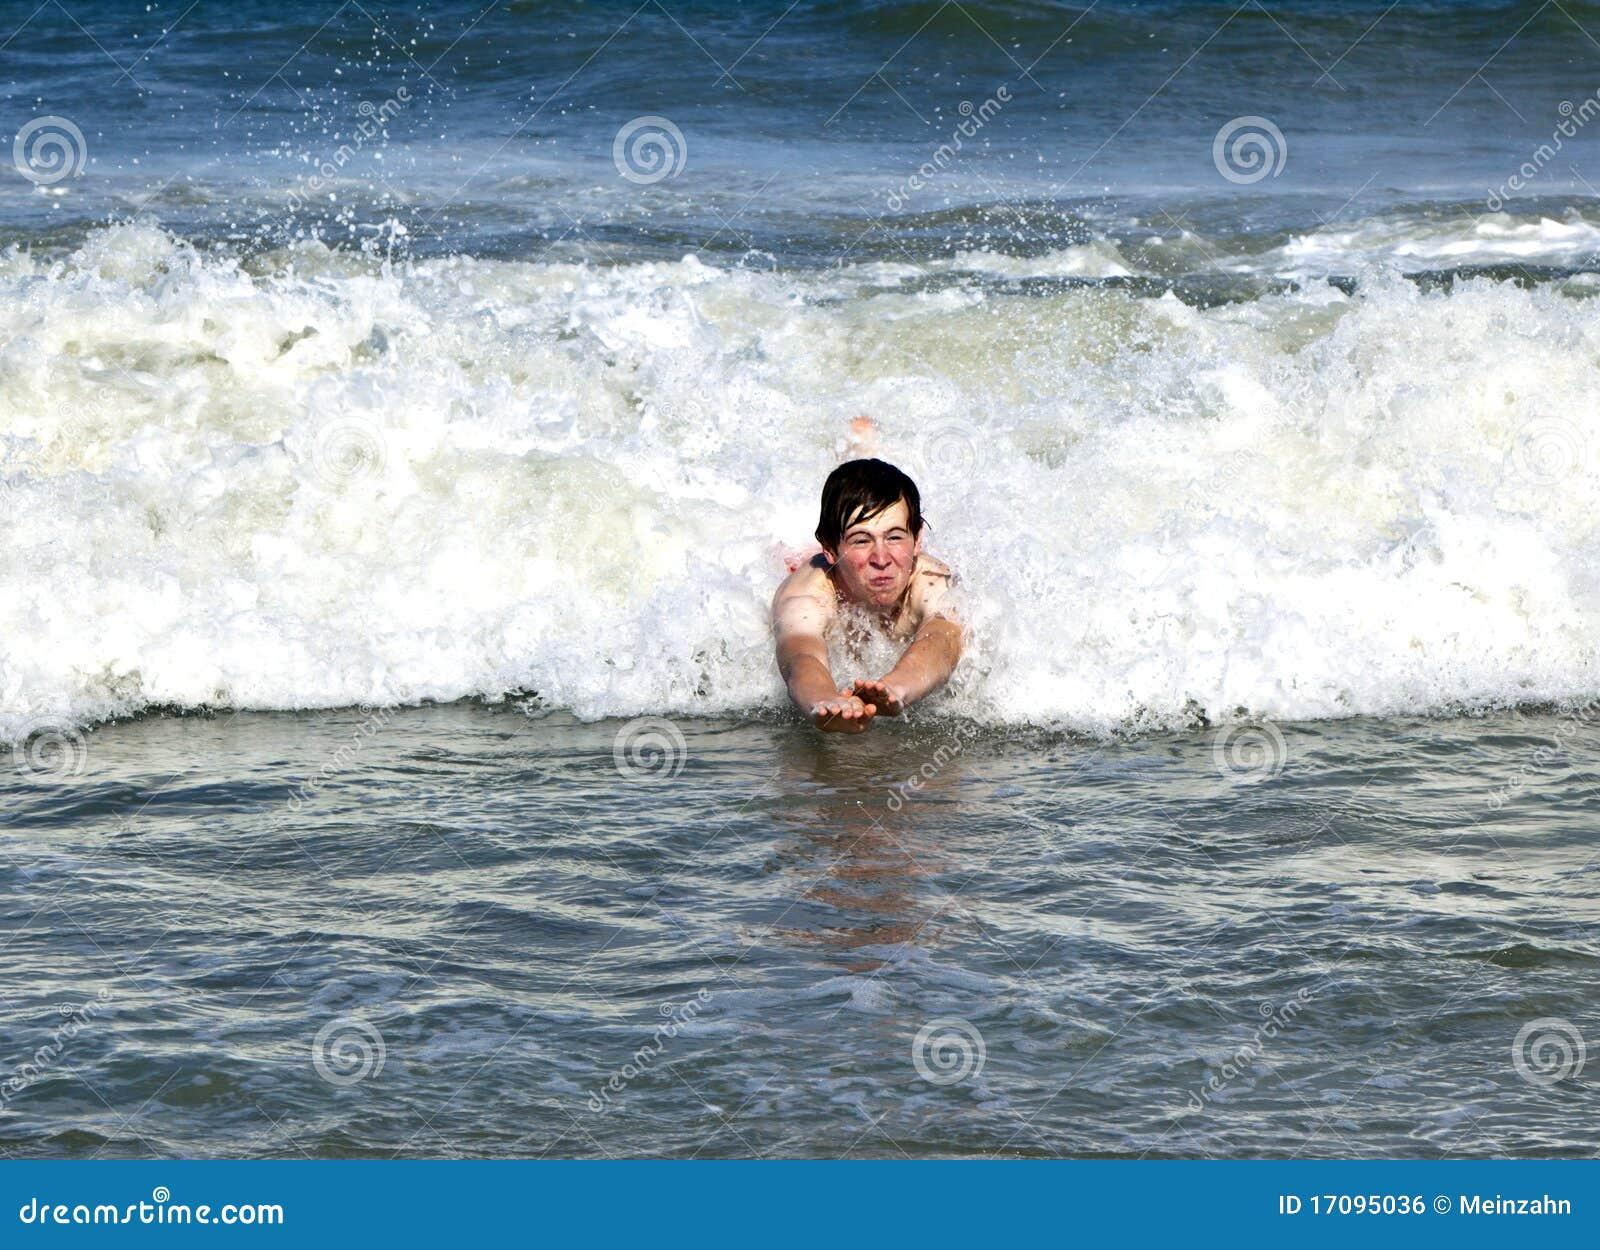 Unga surfa waves för huvuddelpojke